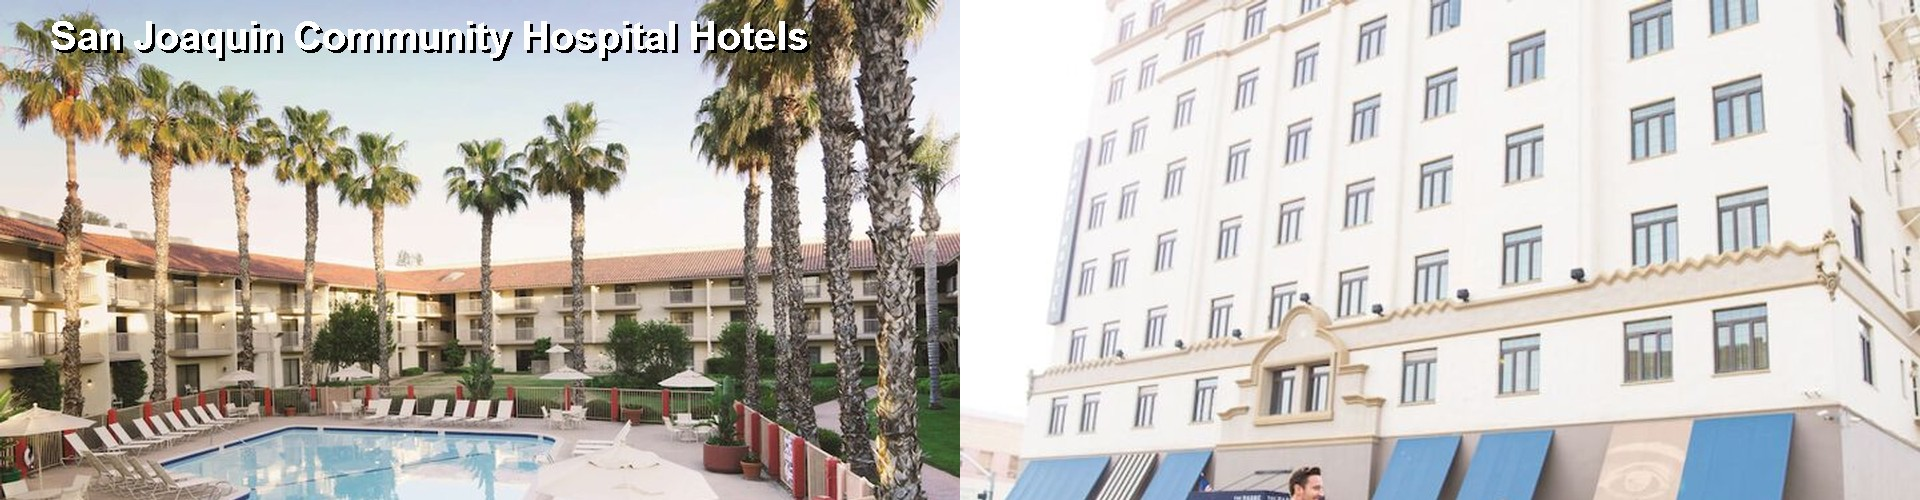 35 Hotels Near San Joaquin Community Hospital In Bakersfield Ca